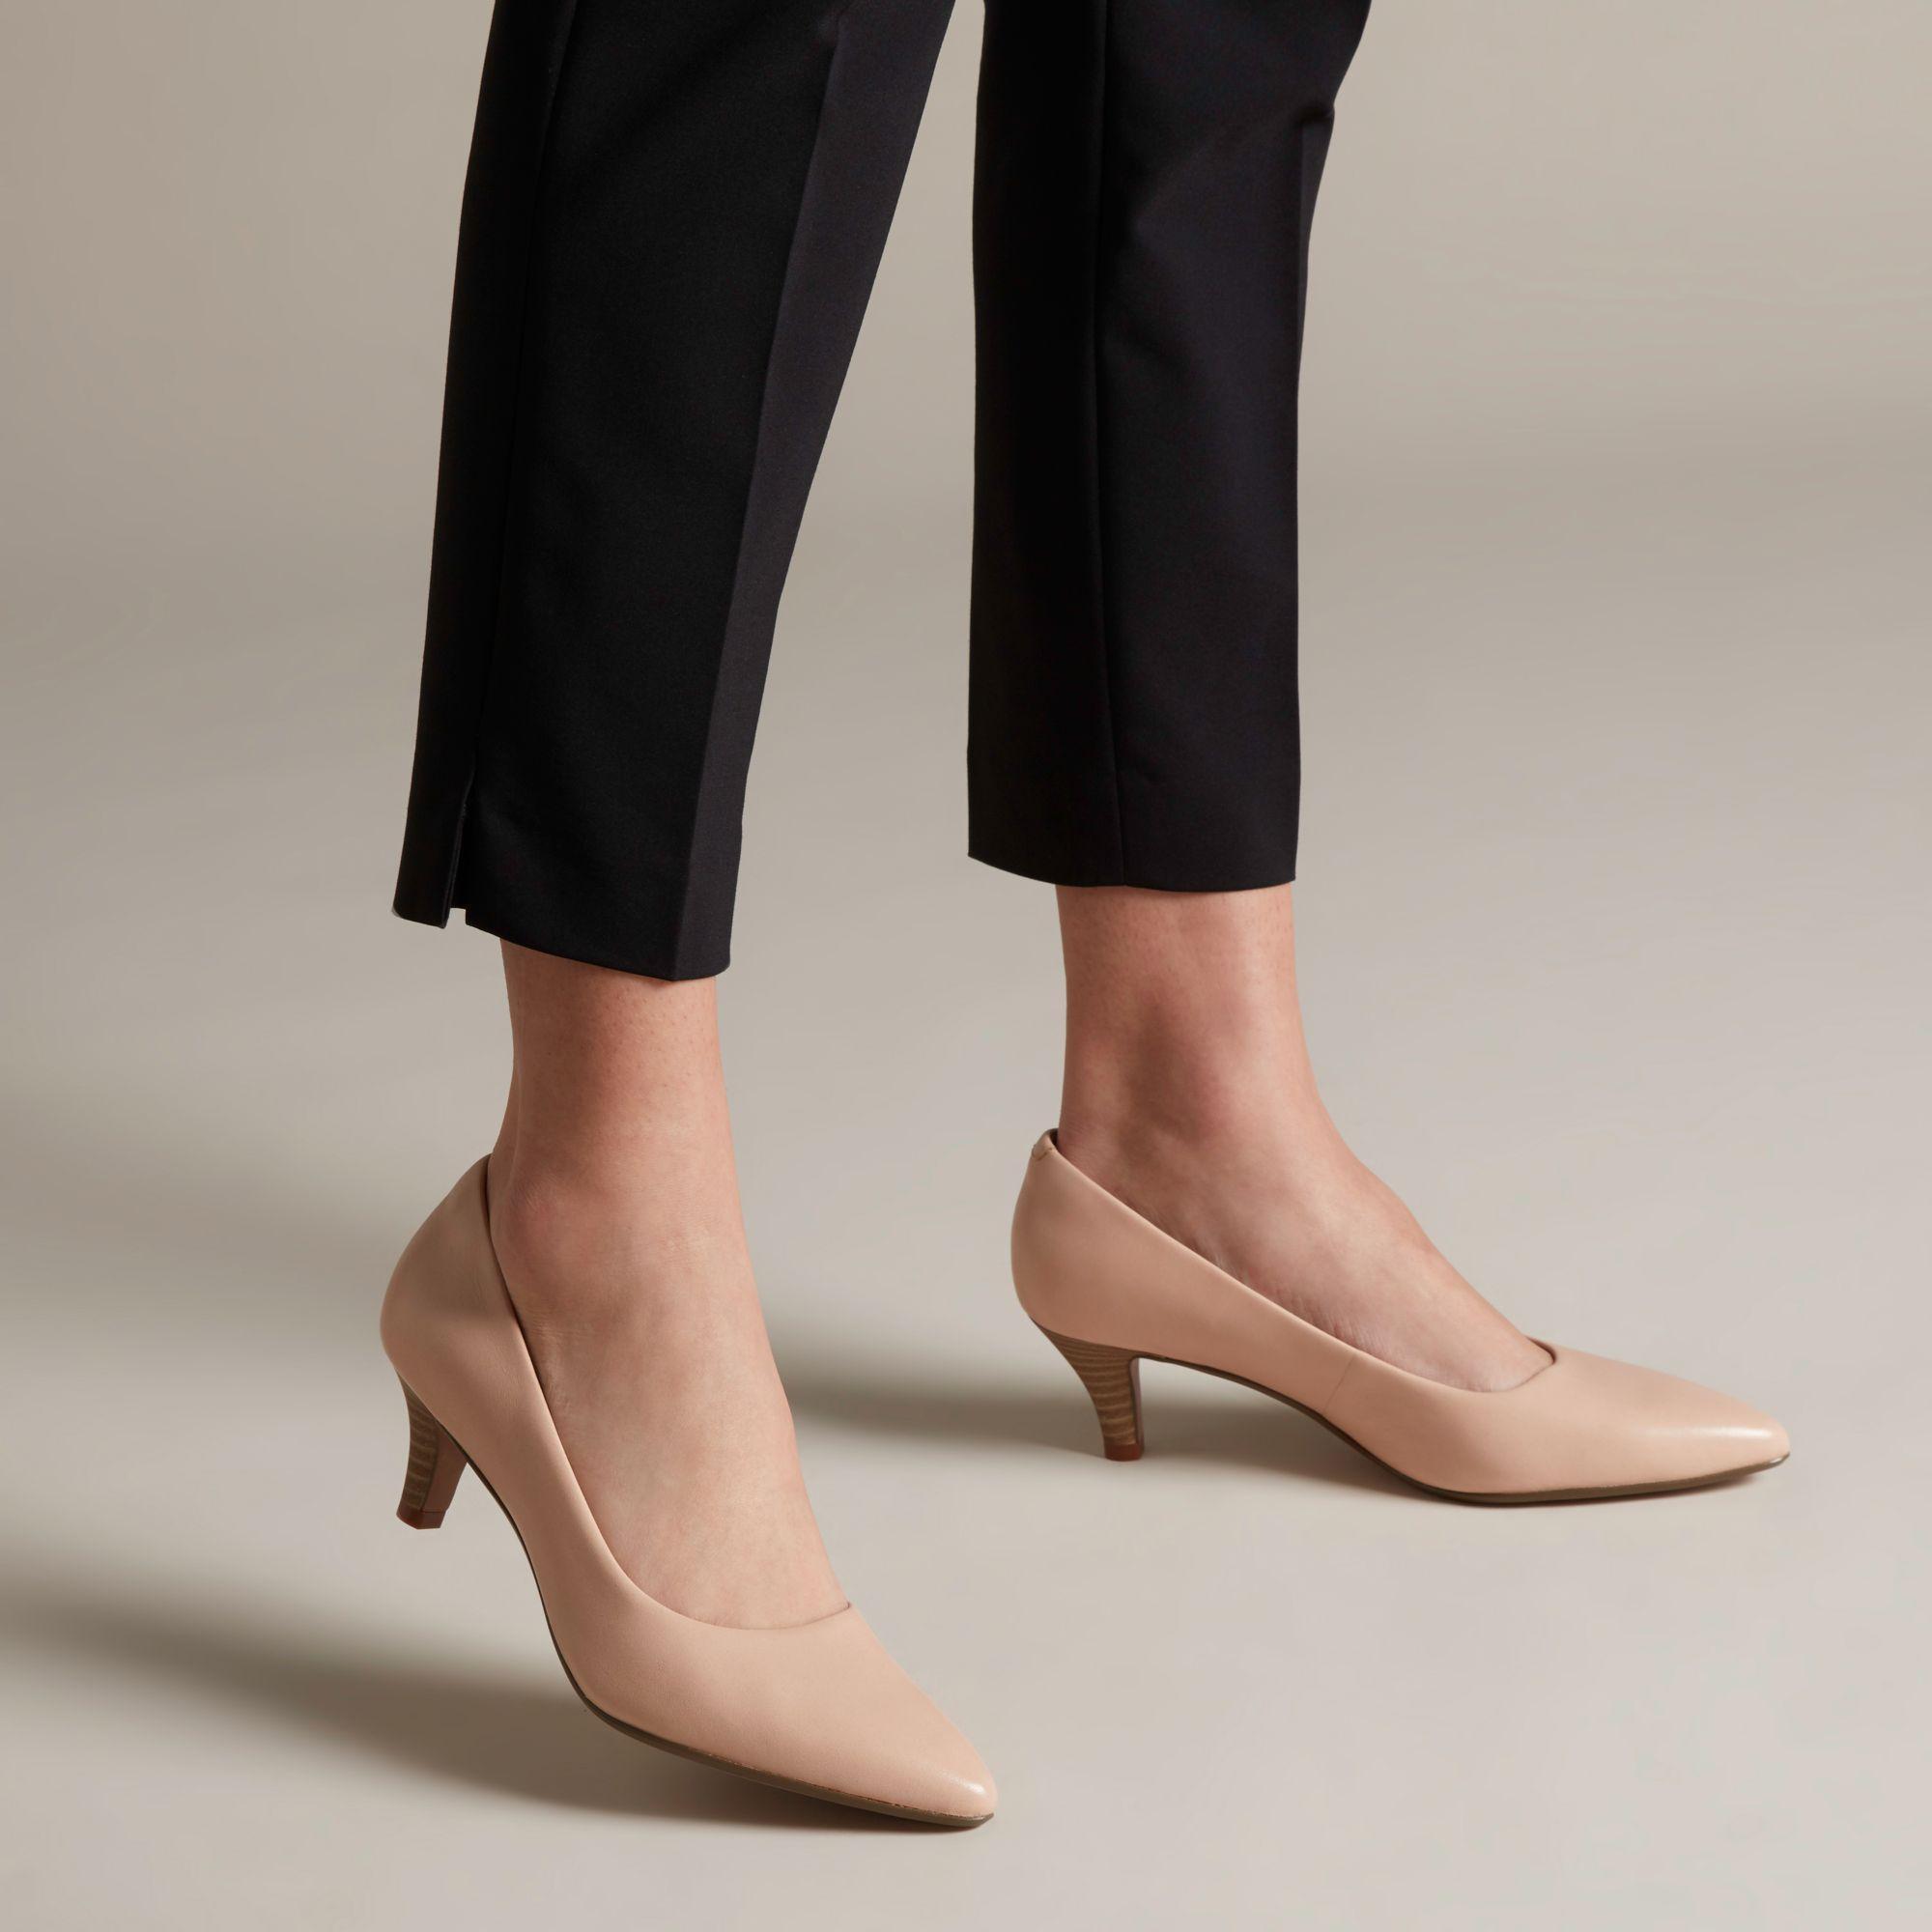 21b9960a99d5a Lyst - Clarks Linvale Jerica Womens Wide Fit Dress Court Shoes ...